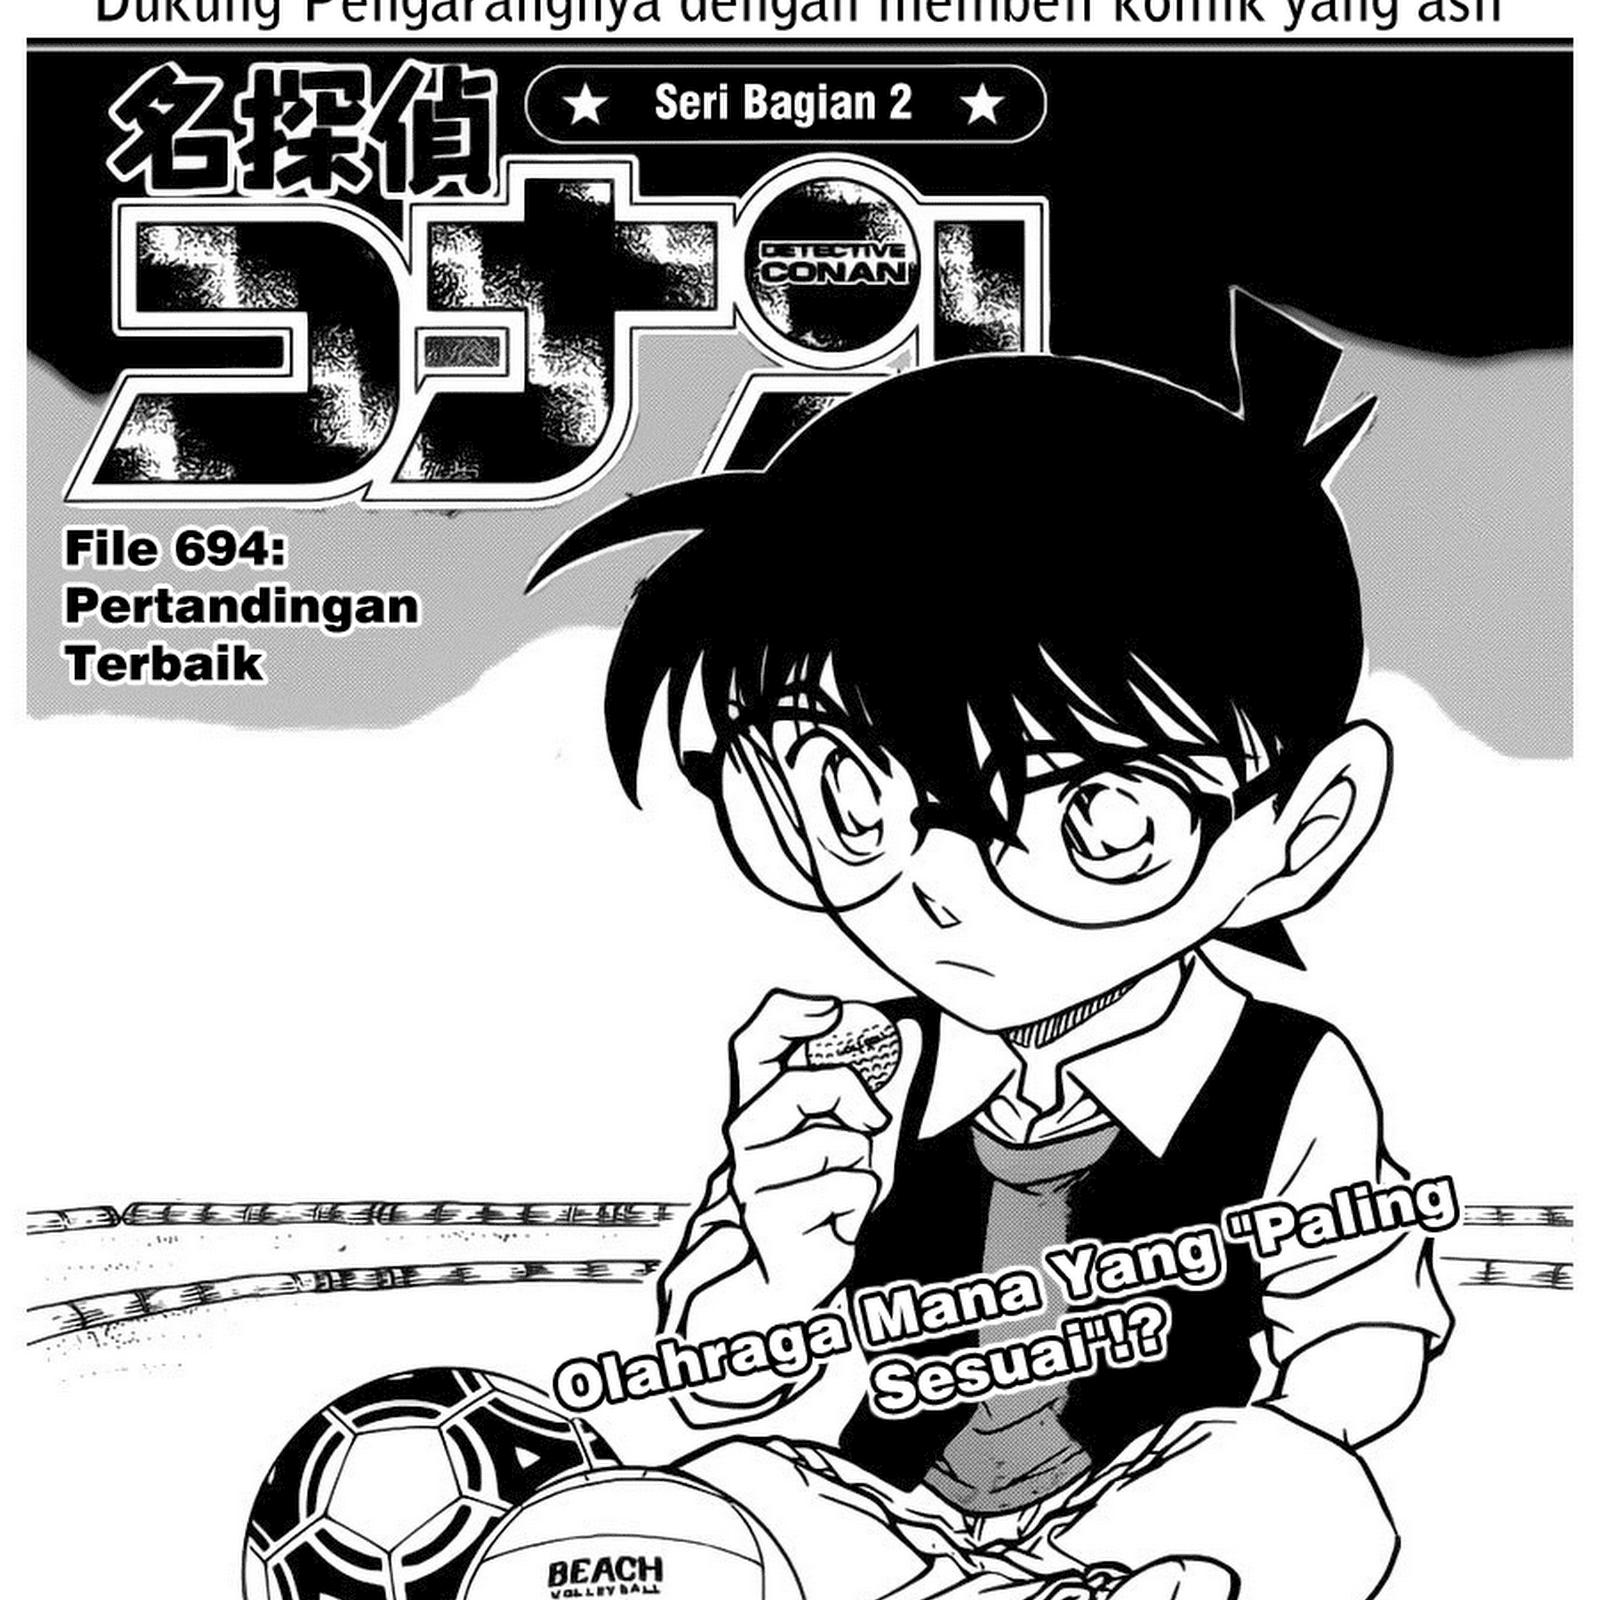 Manga Comic Detective Conan Indonesia Chapter 694 – Pertandingan Terbaik